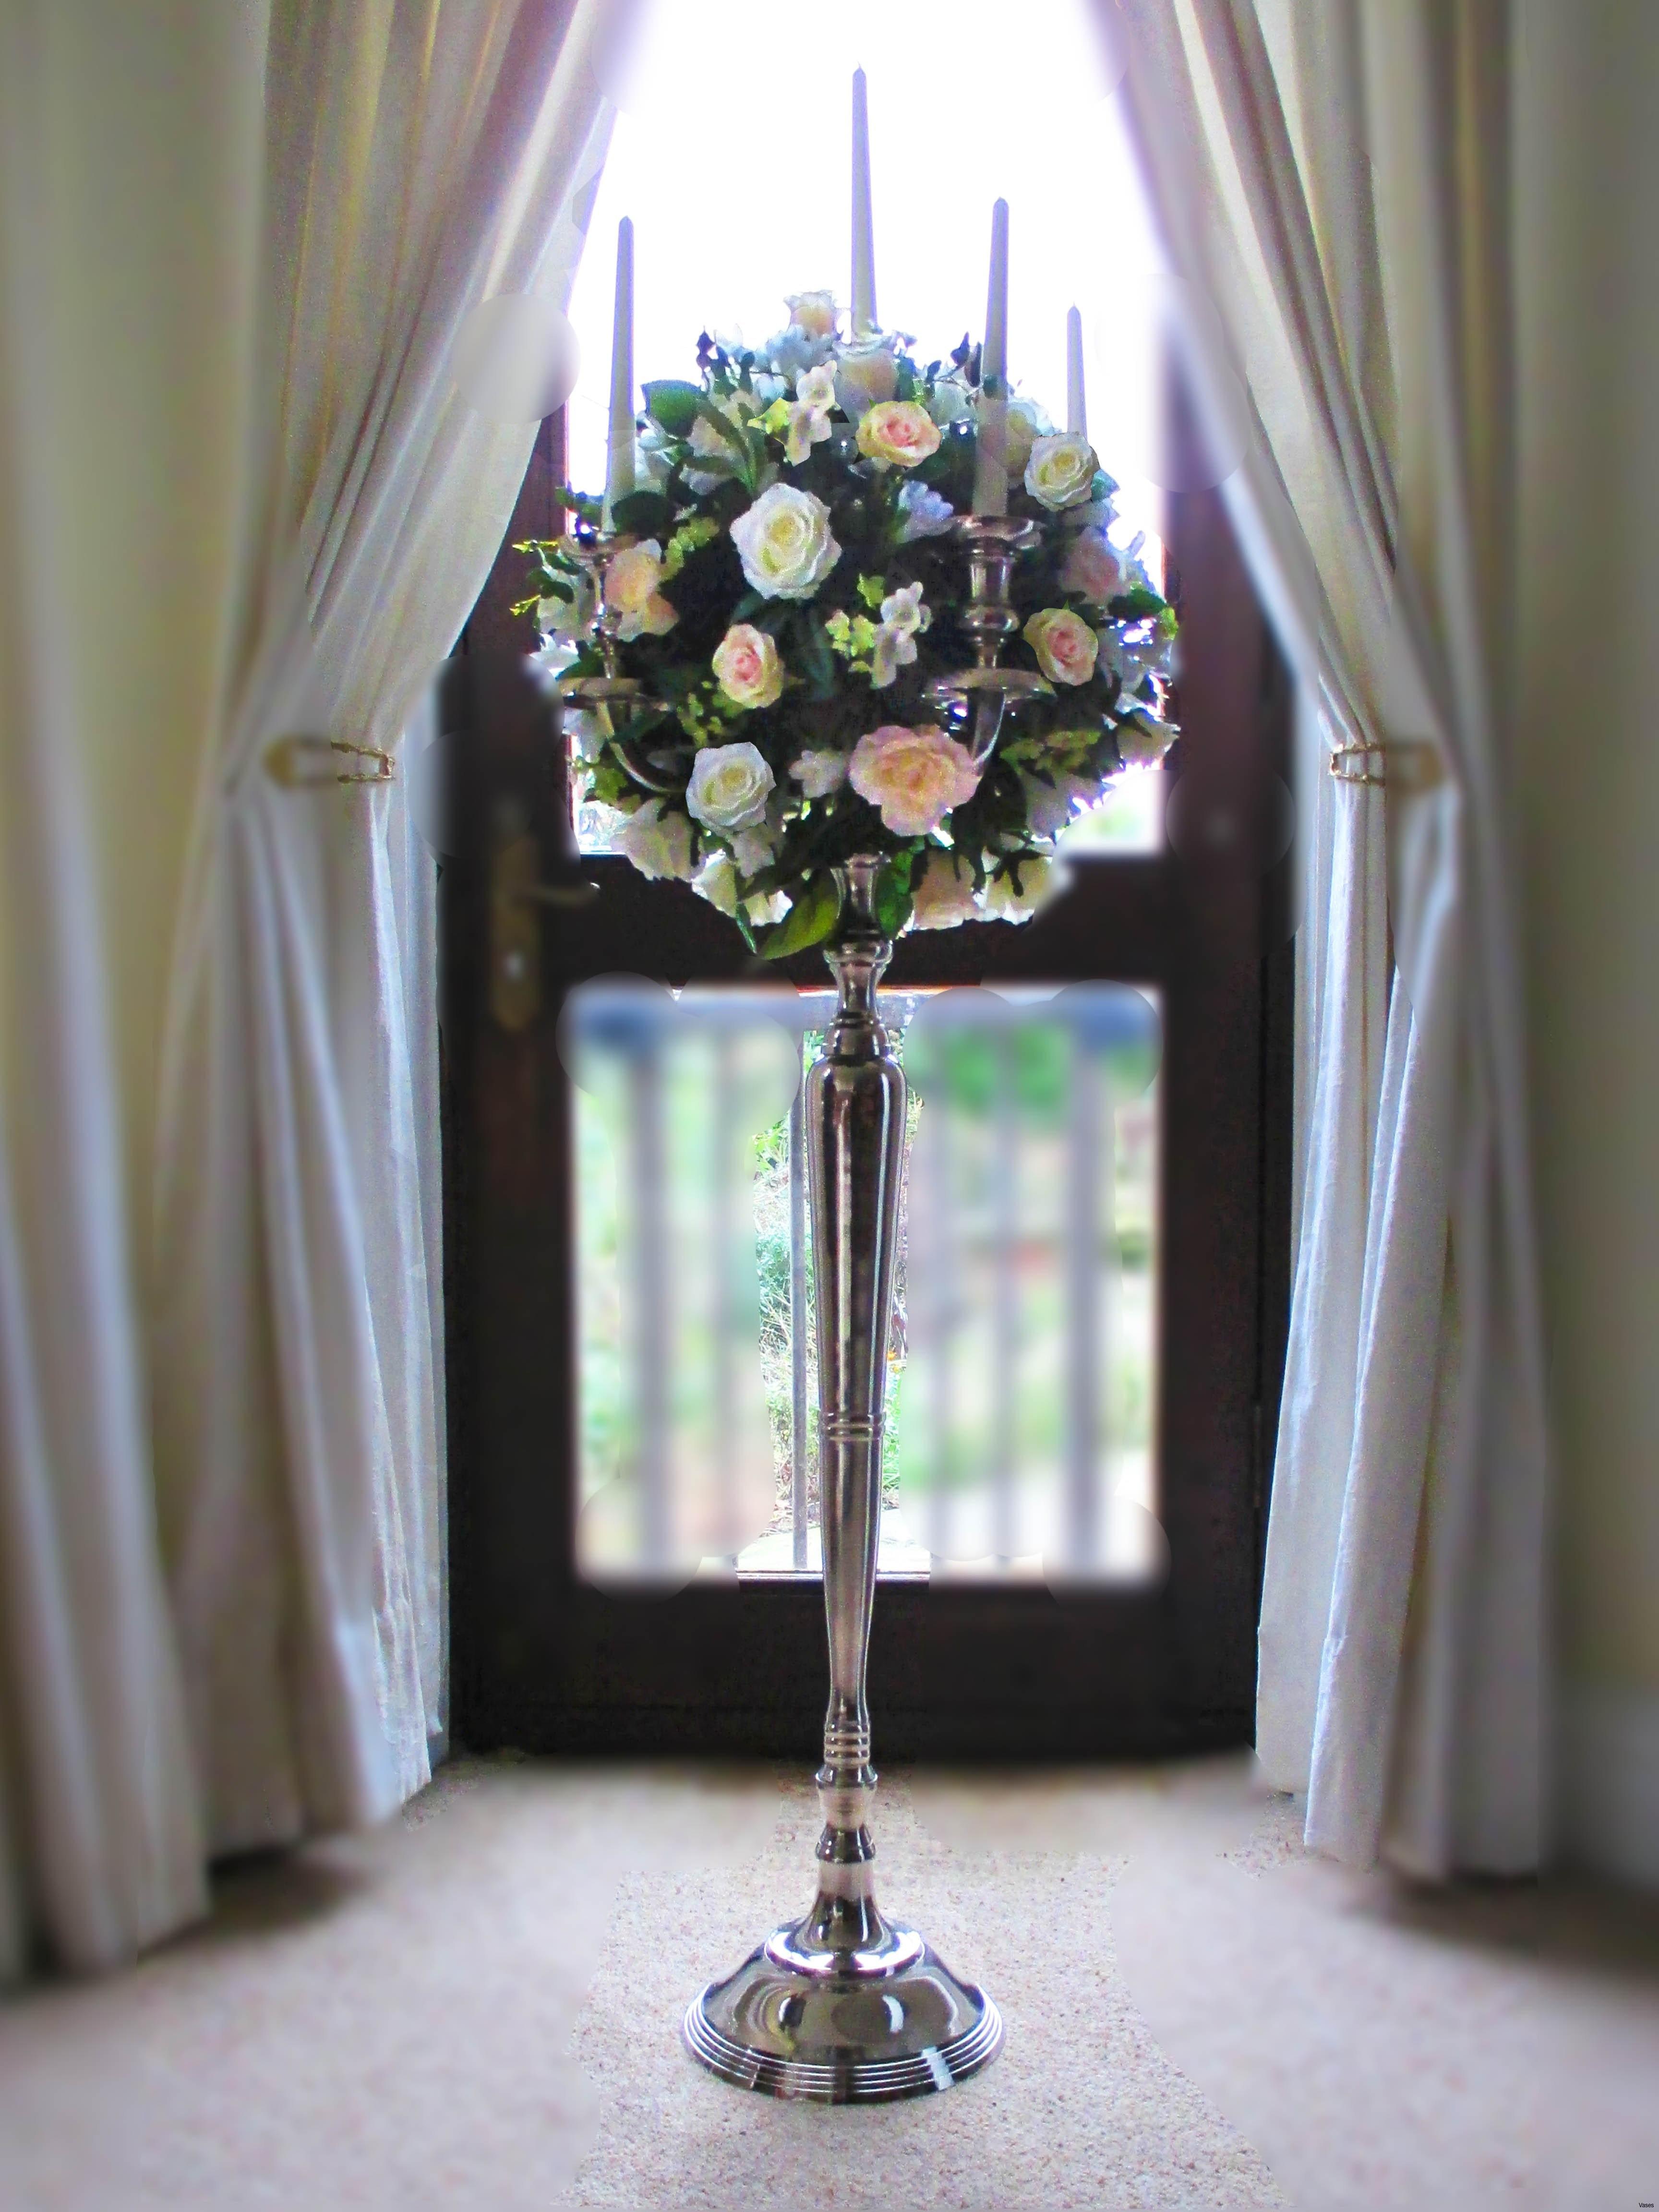 galvanised flower vase of collection of silver flower vases vases artificial plants collection with 35 elegant silver flower vases